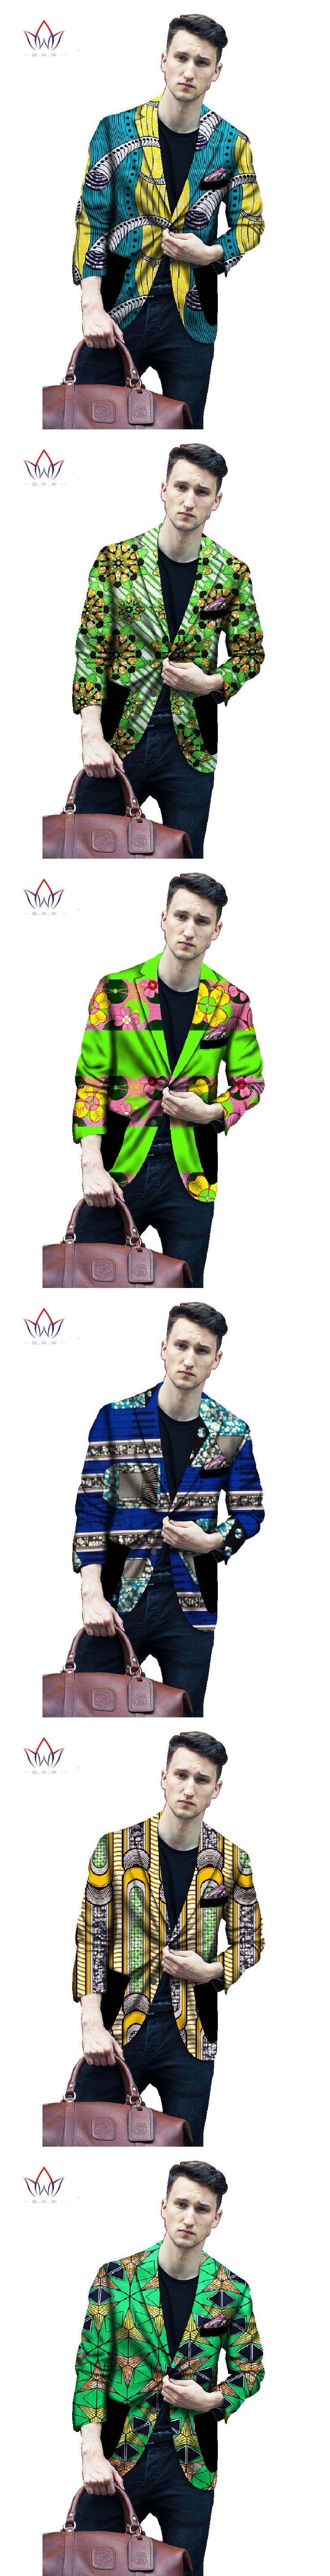 Custom Traditional African Clothing Men Suit Coat Men Blazers Brand Clothing Dashiki Men Clothes Elegant Plus Size BRW WYN147